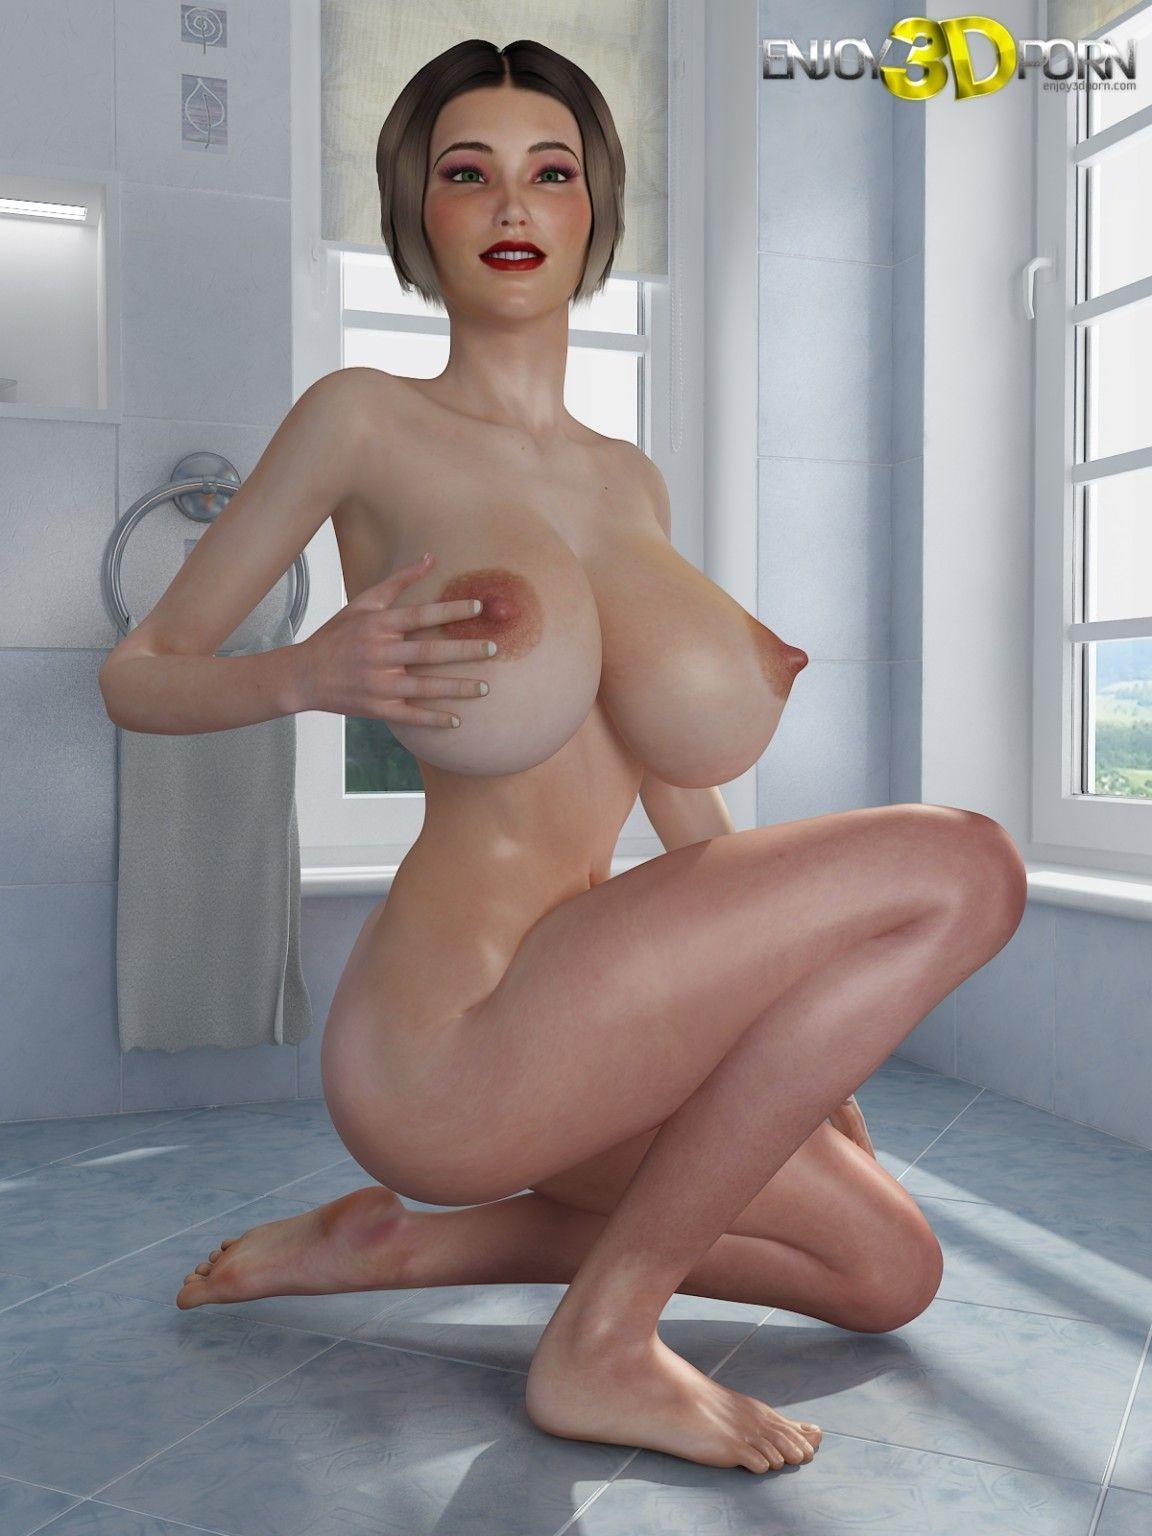 Tied up porn pics